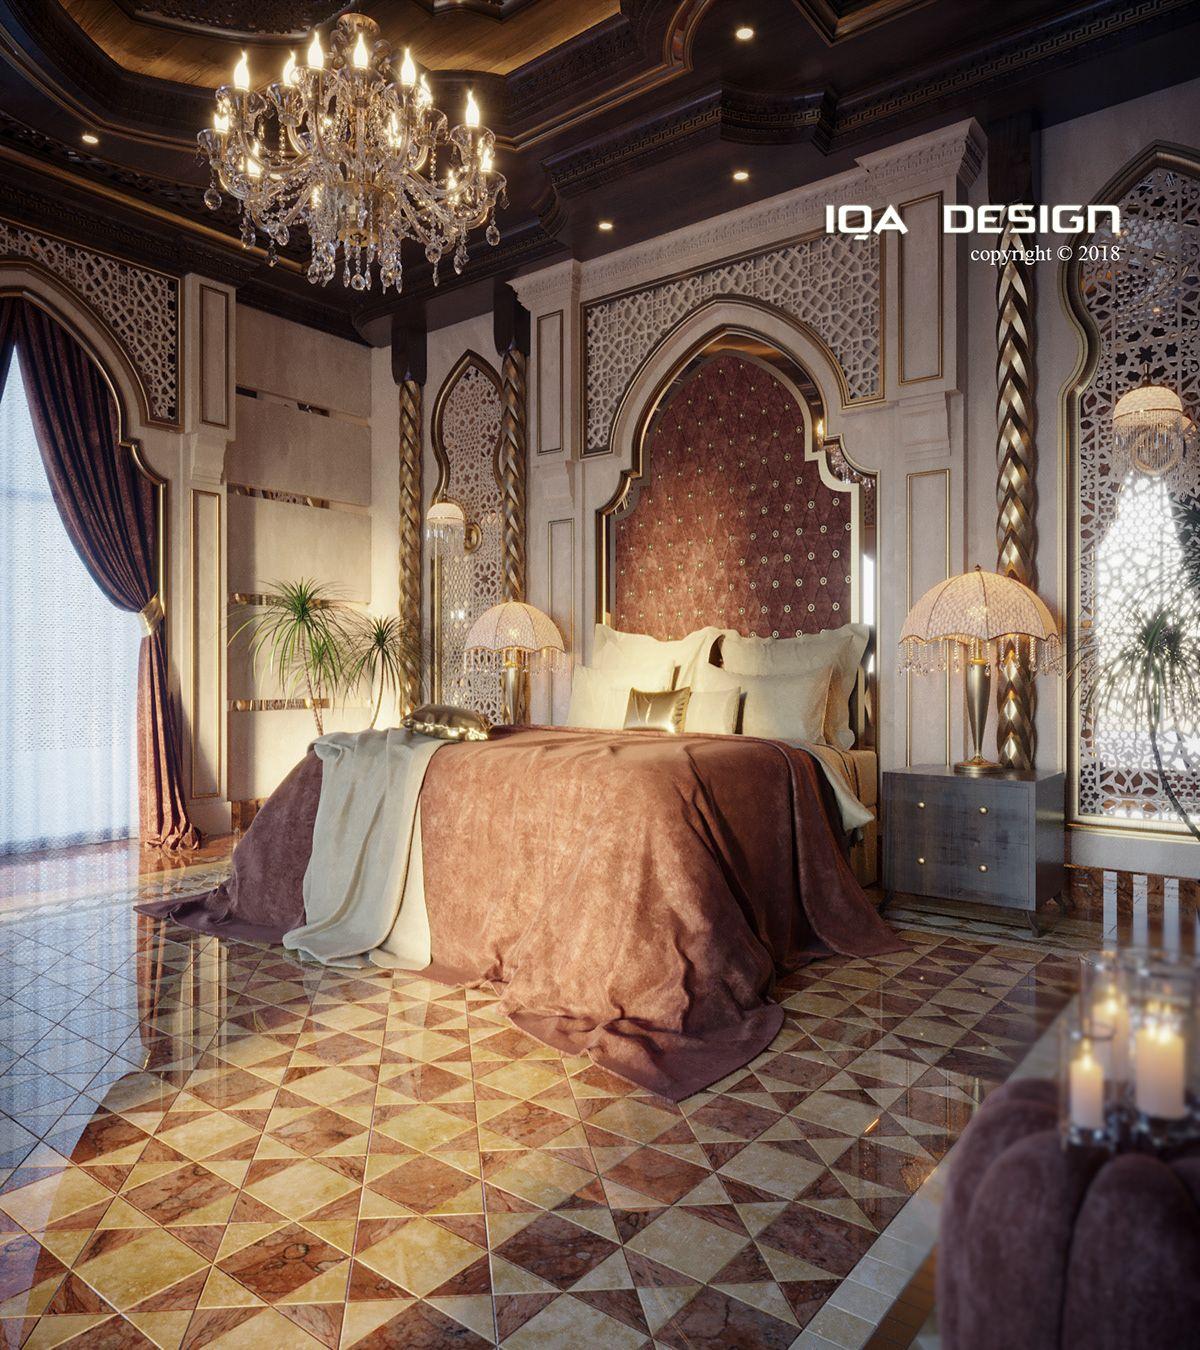 Luxury Master Bedroom Dubai On Behance: Master BEDROOM On Behance (With Images)